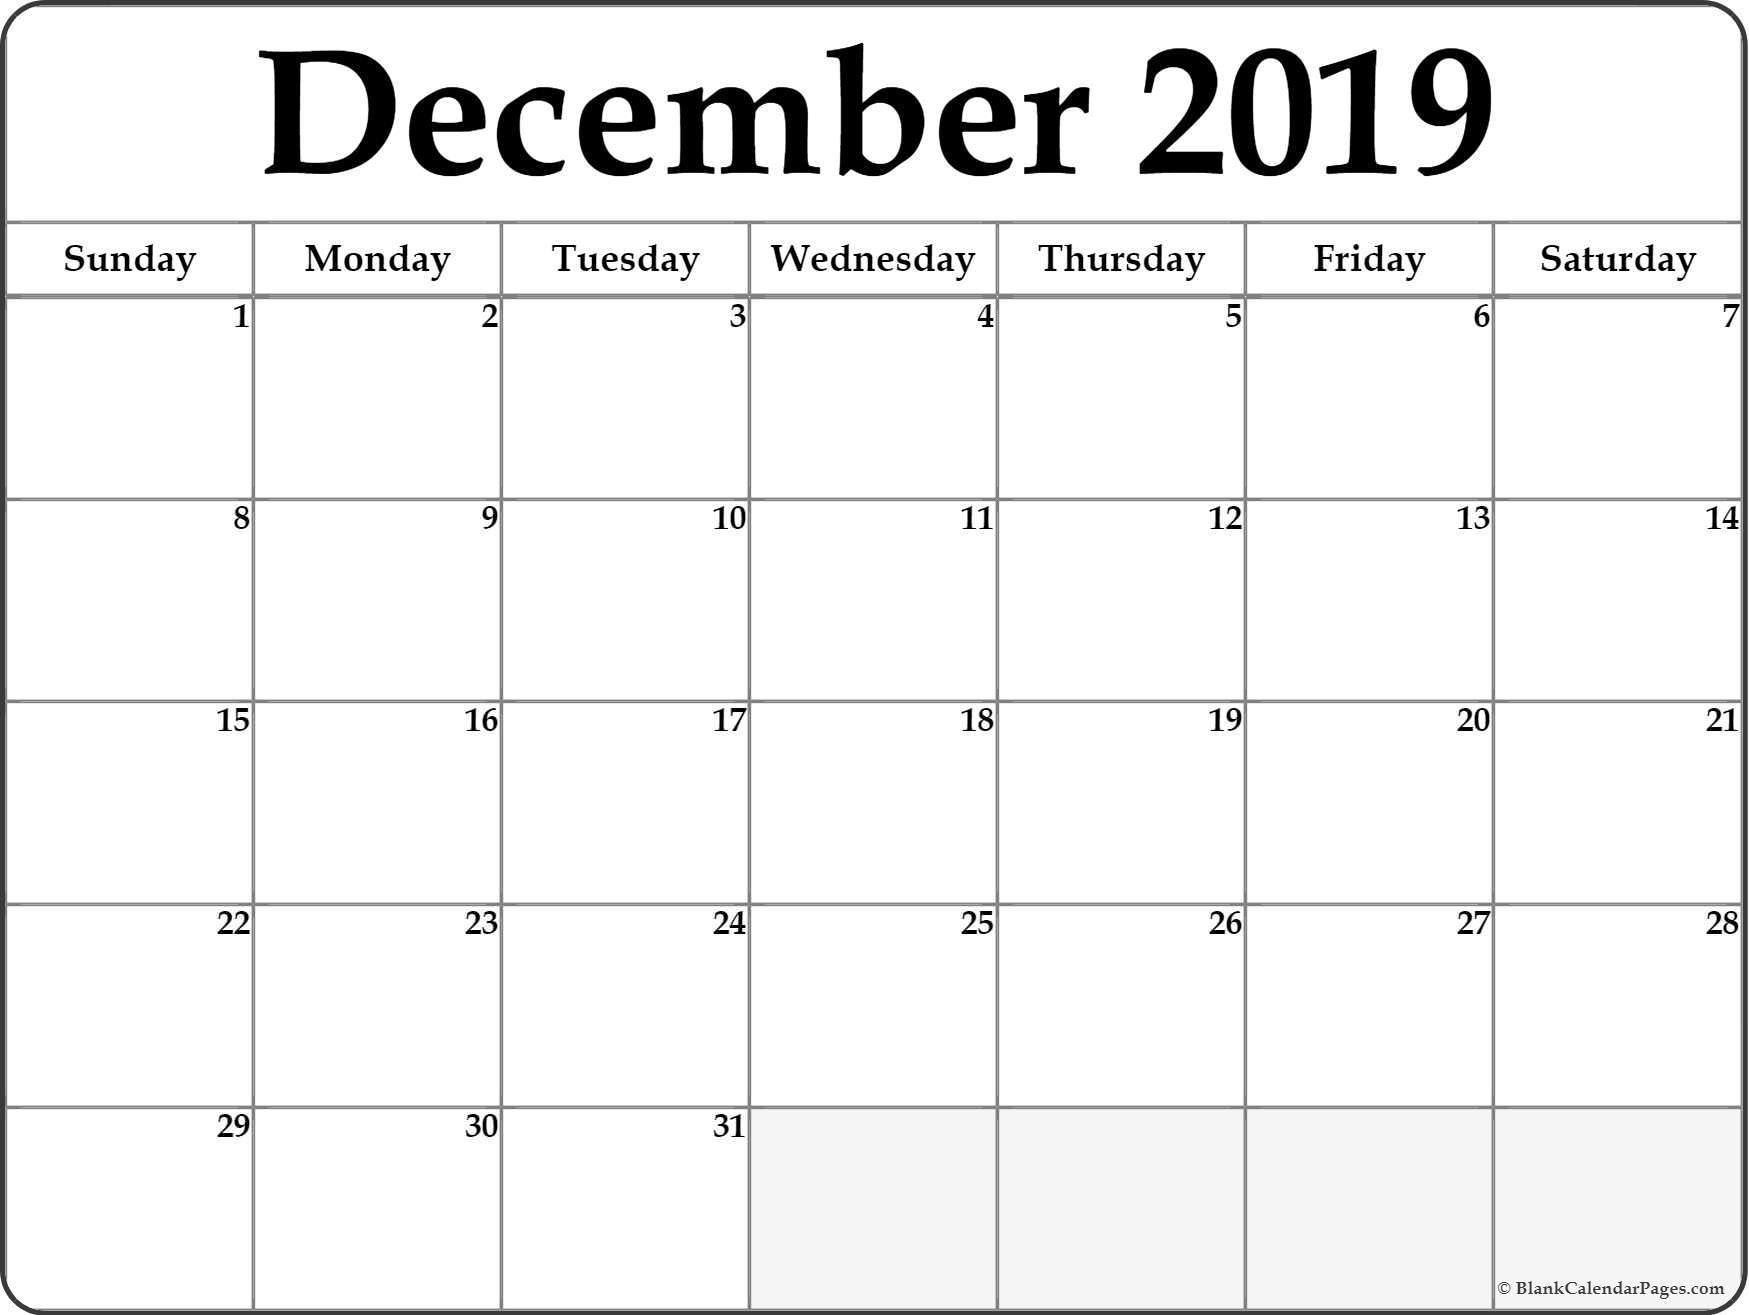 December 2019 Printable Calendar | Isacl